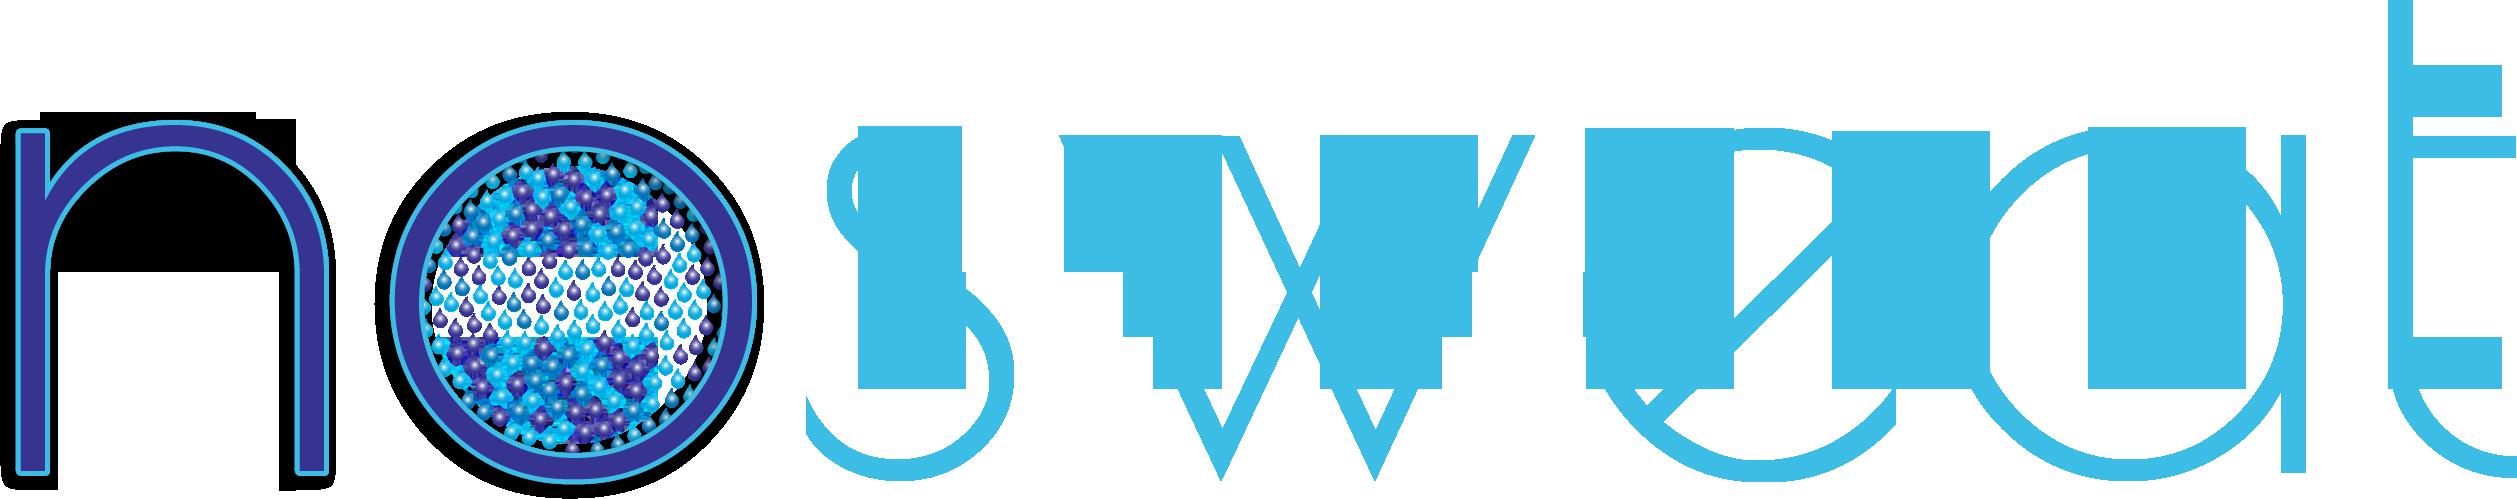 logo_nosweat